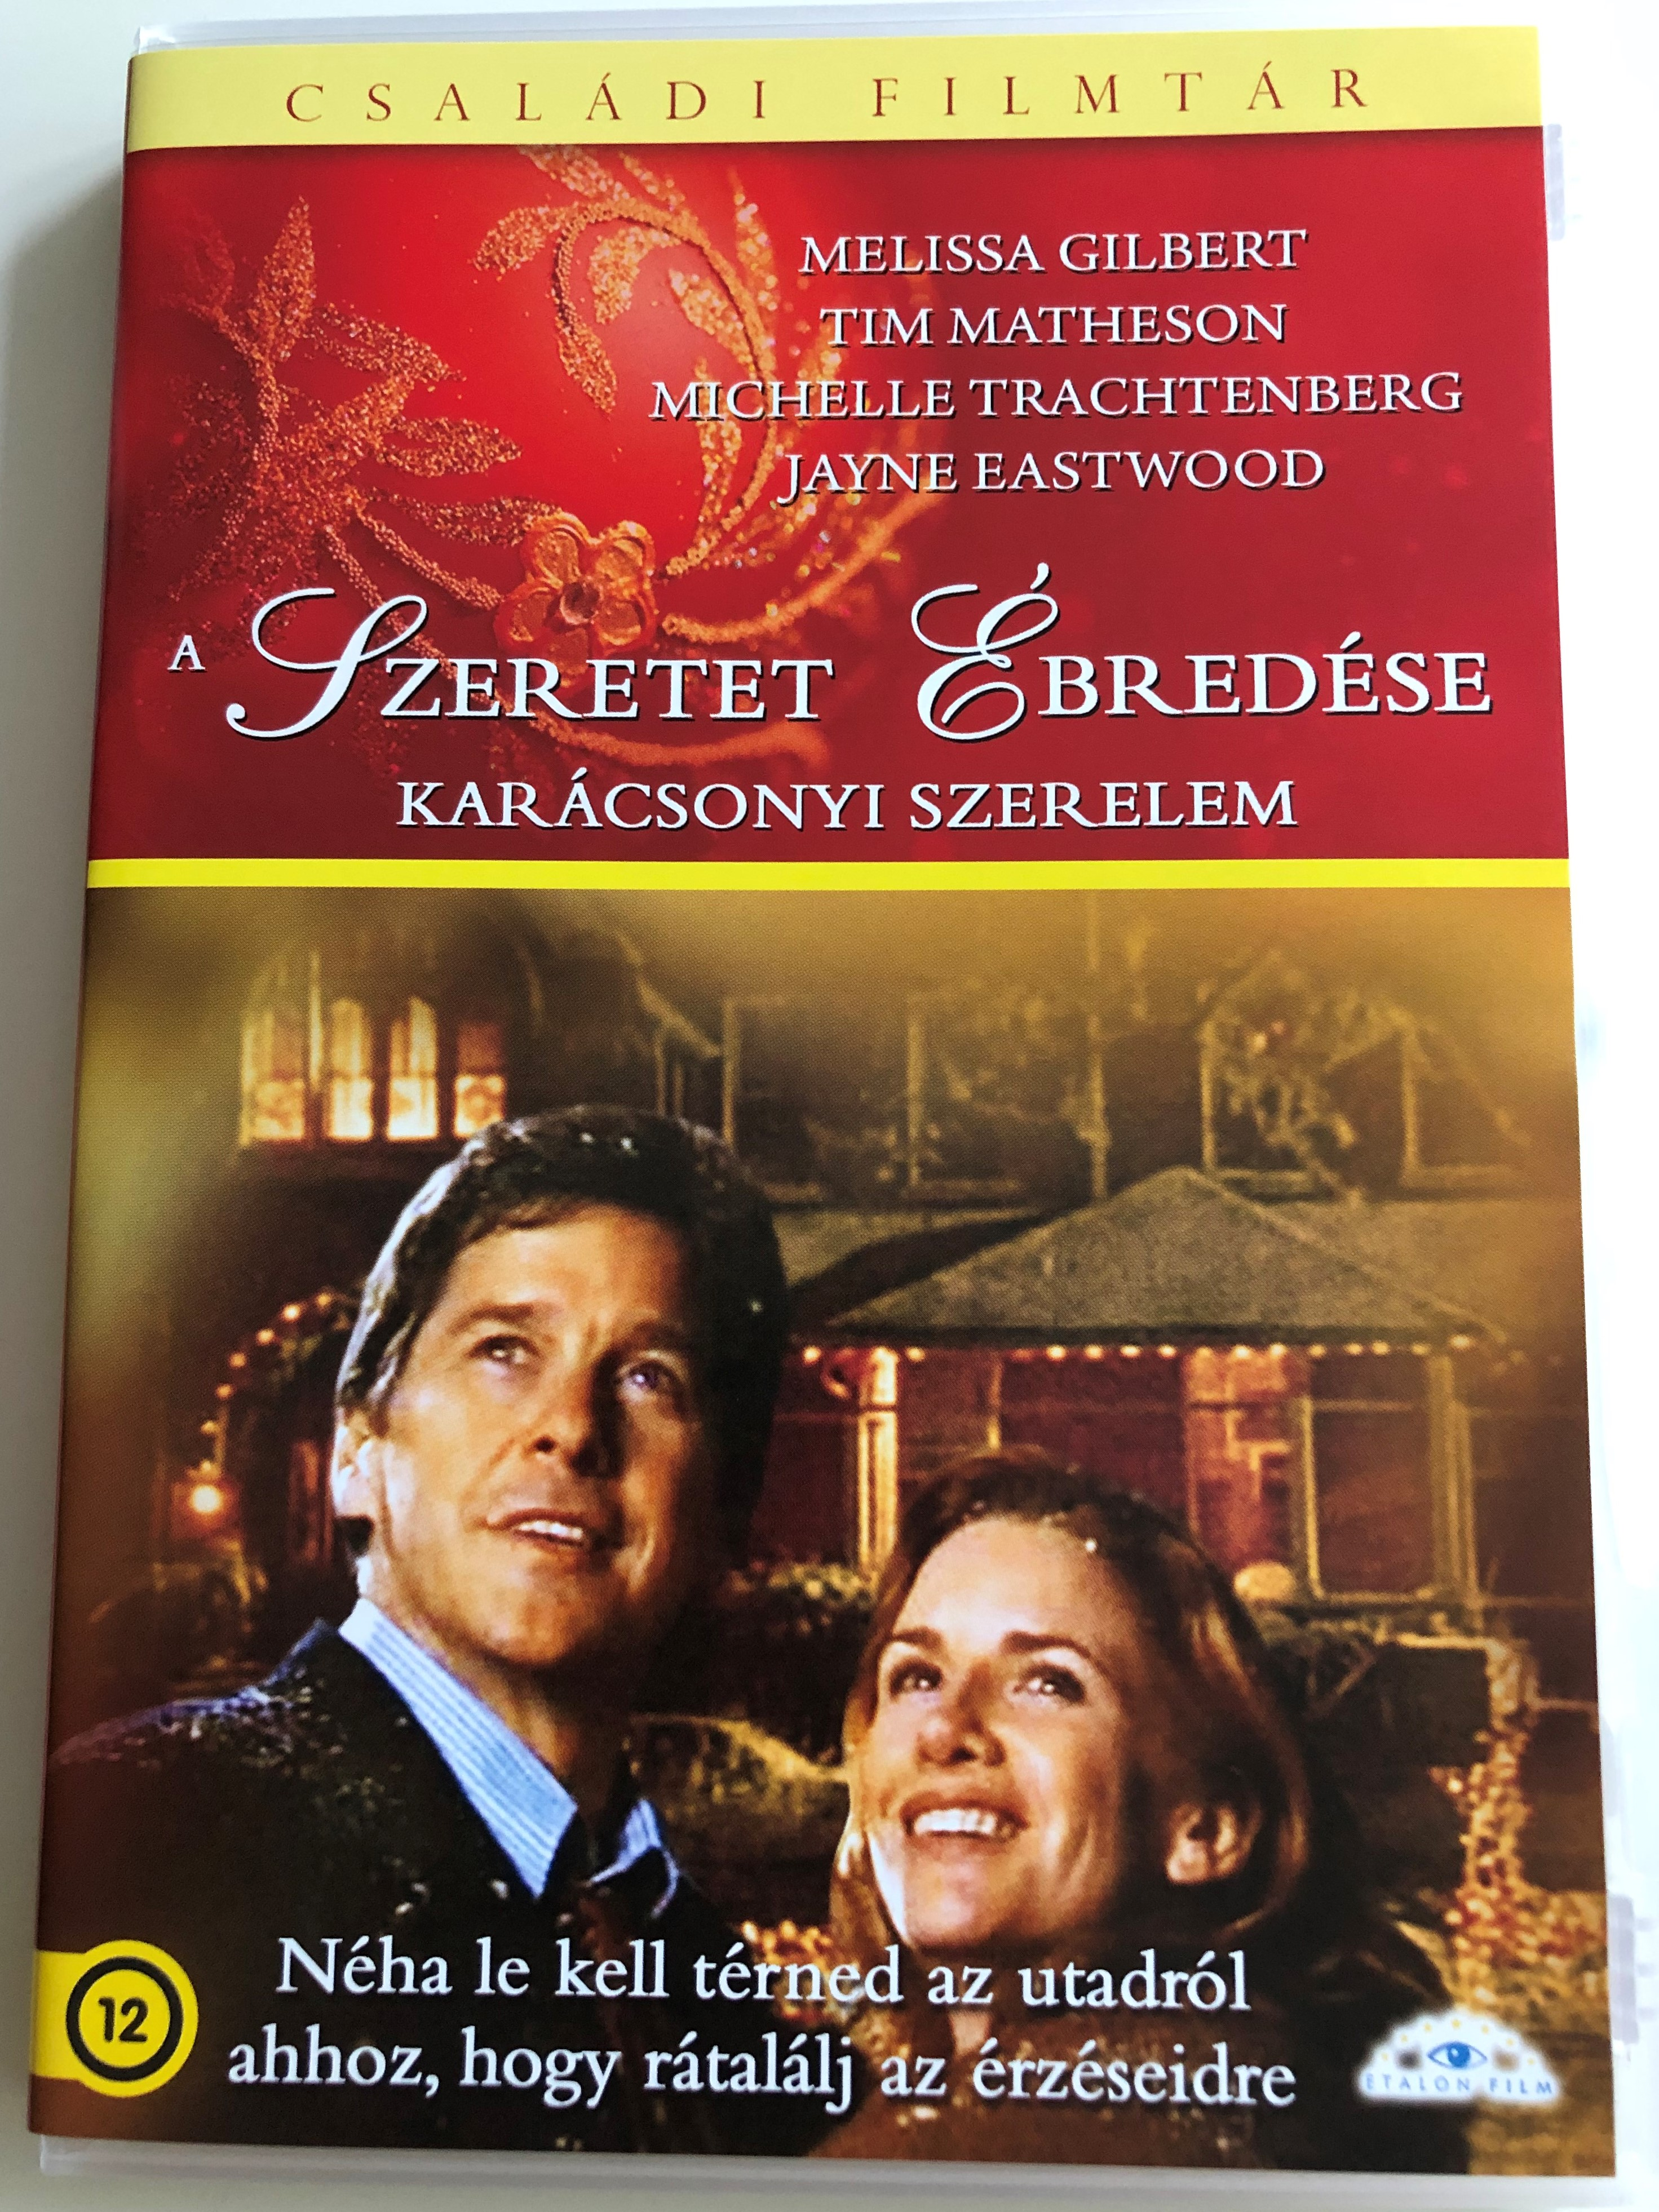 a-holiday-for-love-dvd-1996-a-szeretet-bred-se-kar-csonyi-szerelem-directed-by-jerry-london-starring-melissa-gilbert-tim-matheson-michelle-trachtenbert-jayne-eastwood-csal-di-filmt-r-1-.jpg